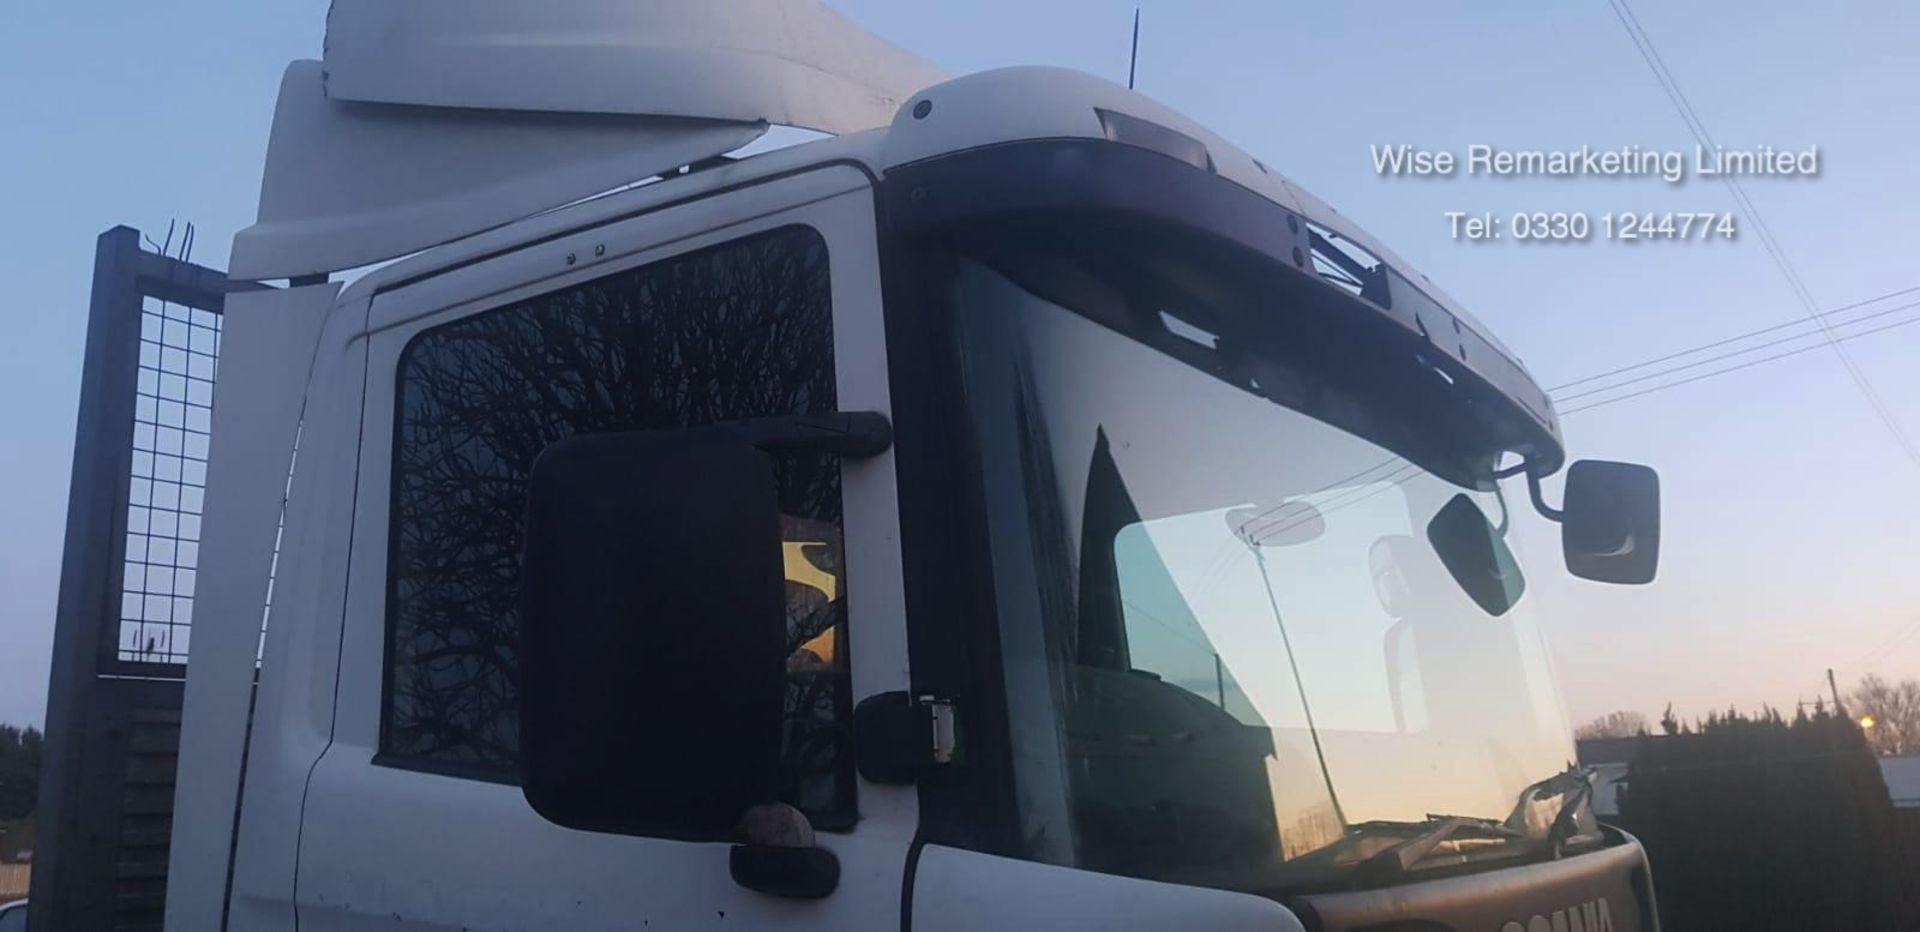 Lot 34 - (Reserve Met) Scania 94d.220 18 Tonne 4x2 Flat Bed Lorry - W Reg 2000 Year - SAVE 20% NO VAT